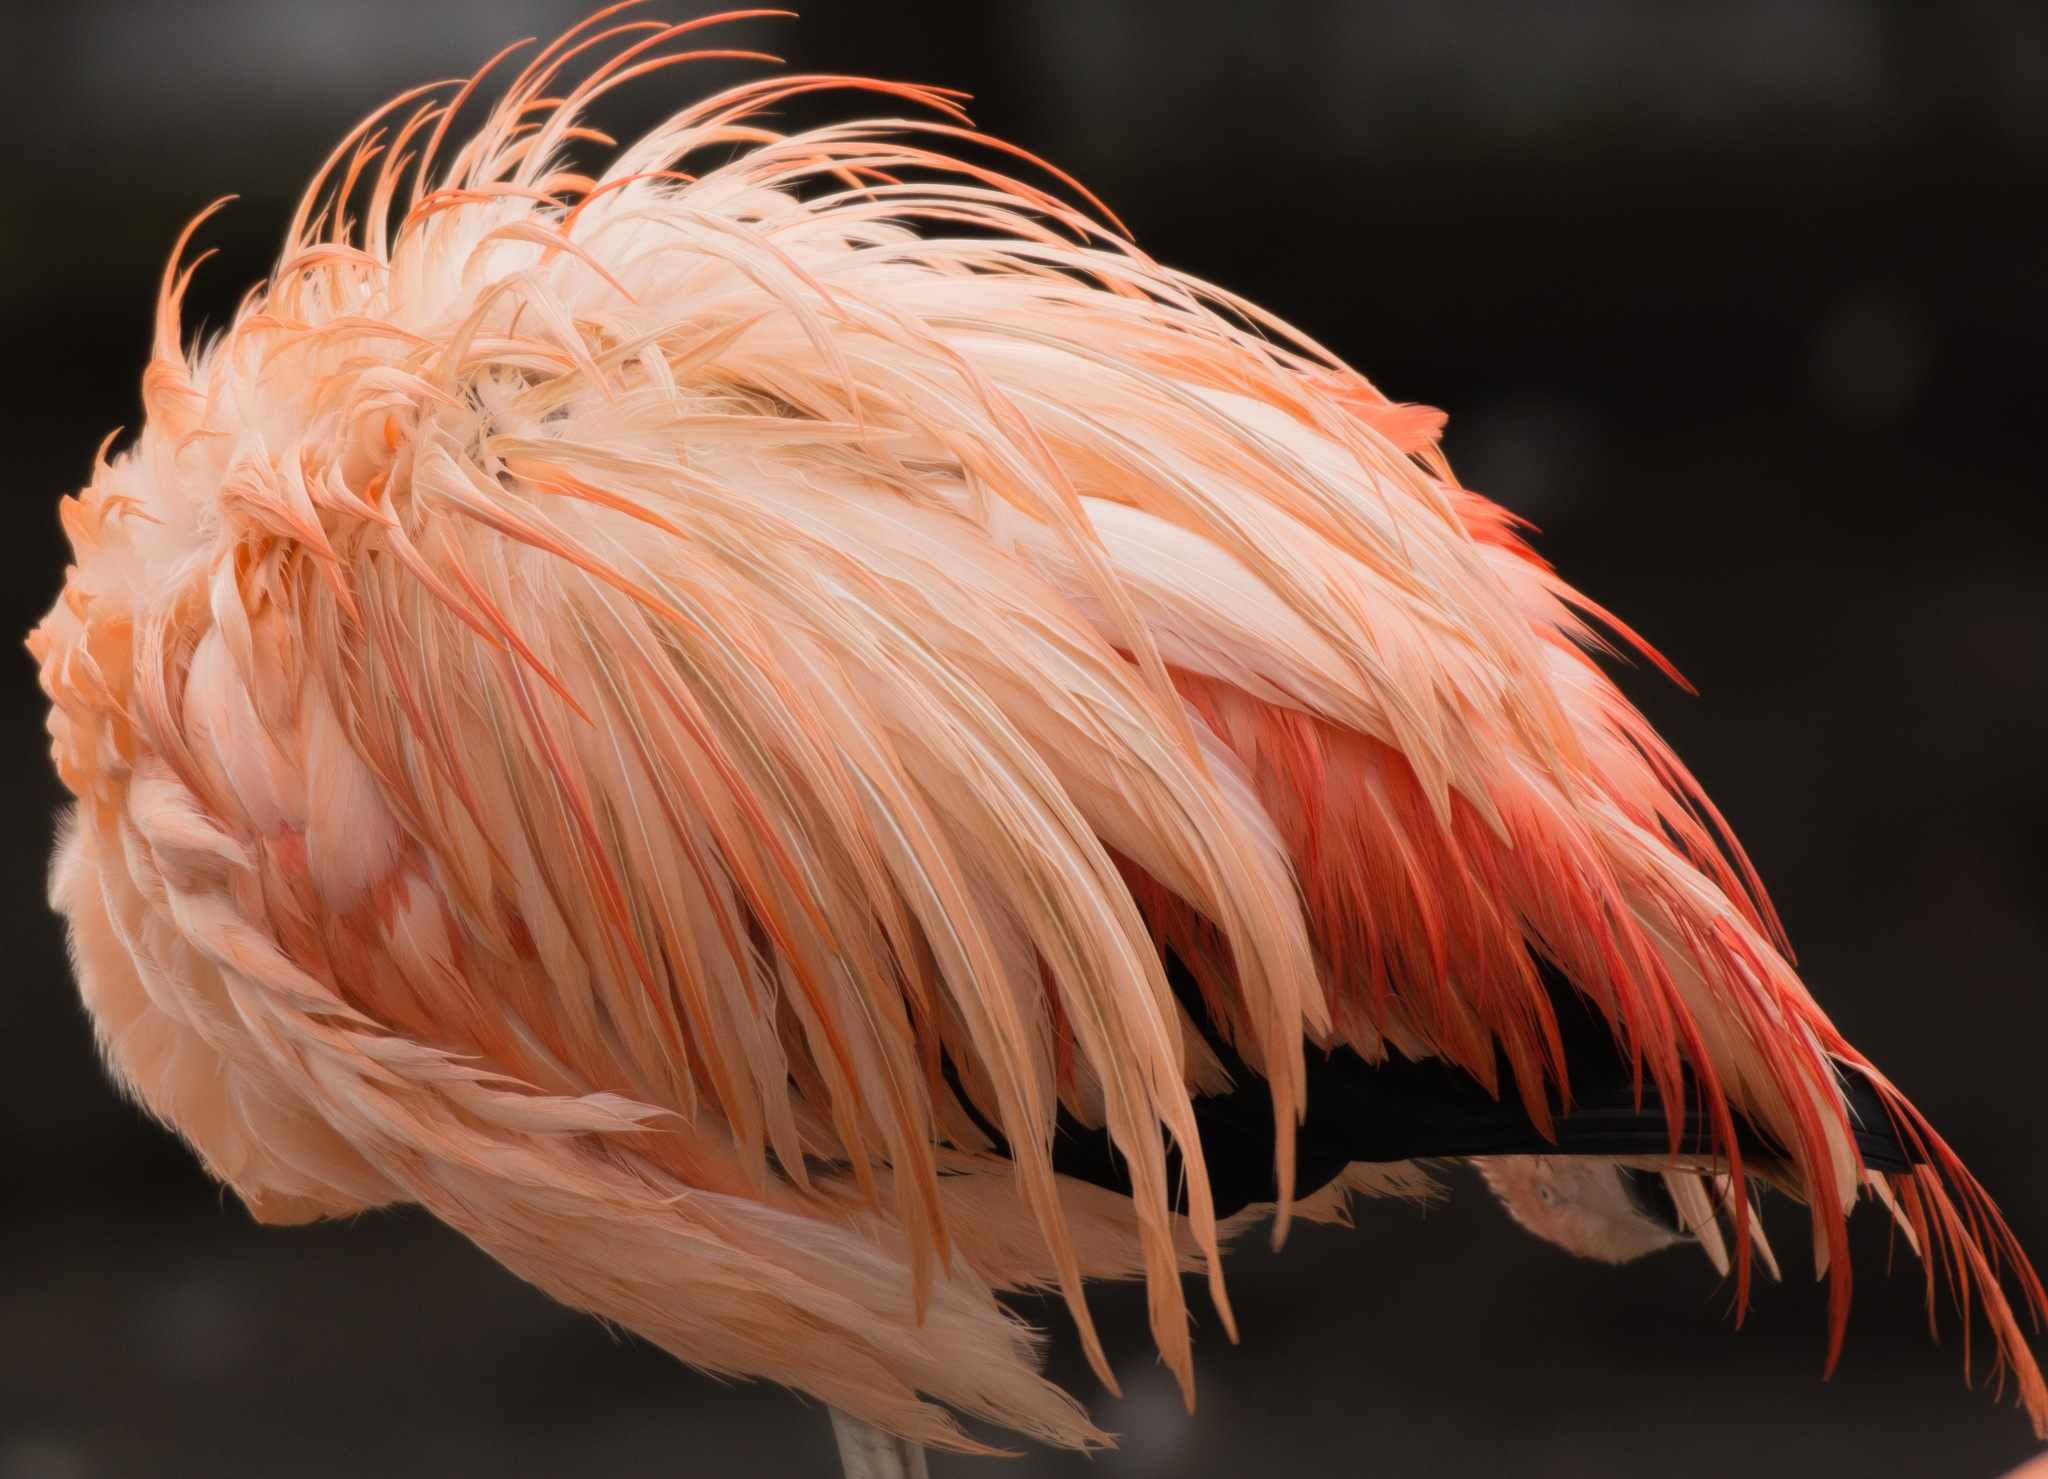 Flamingo  by Dennis riezebos